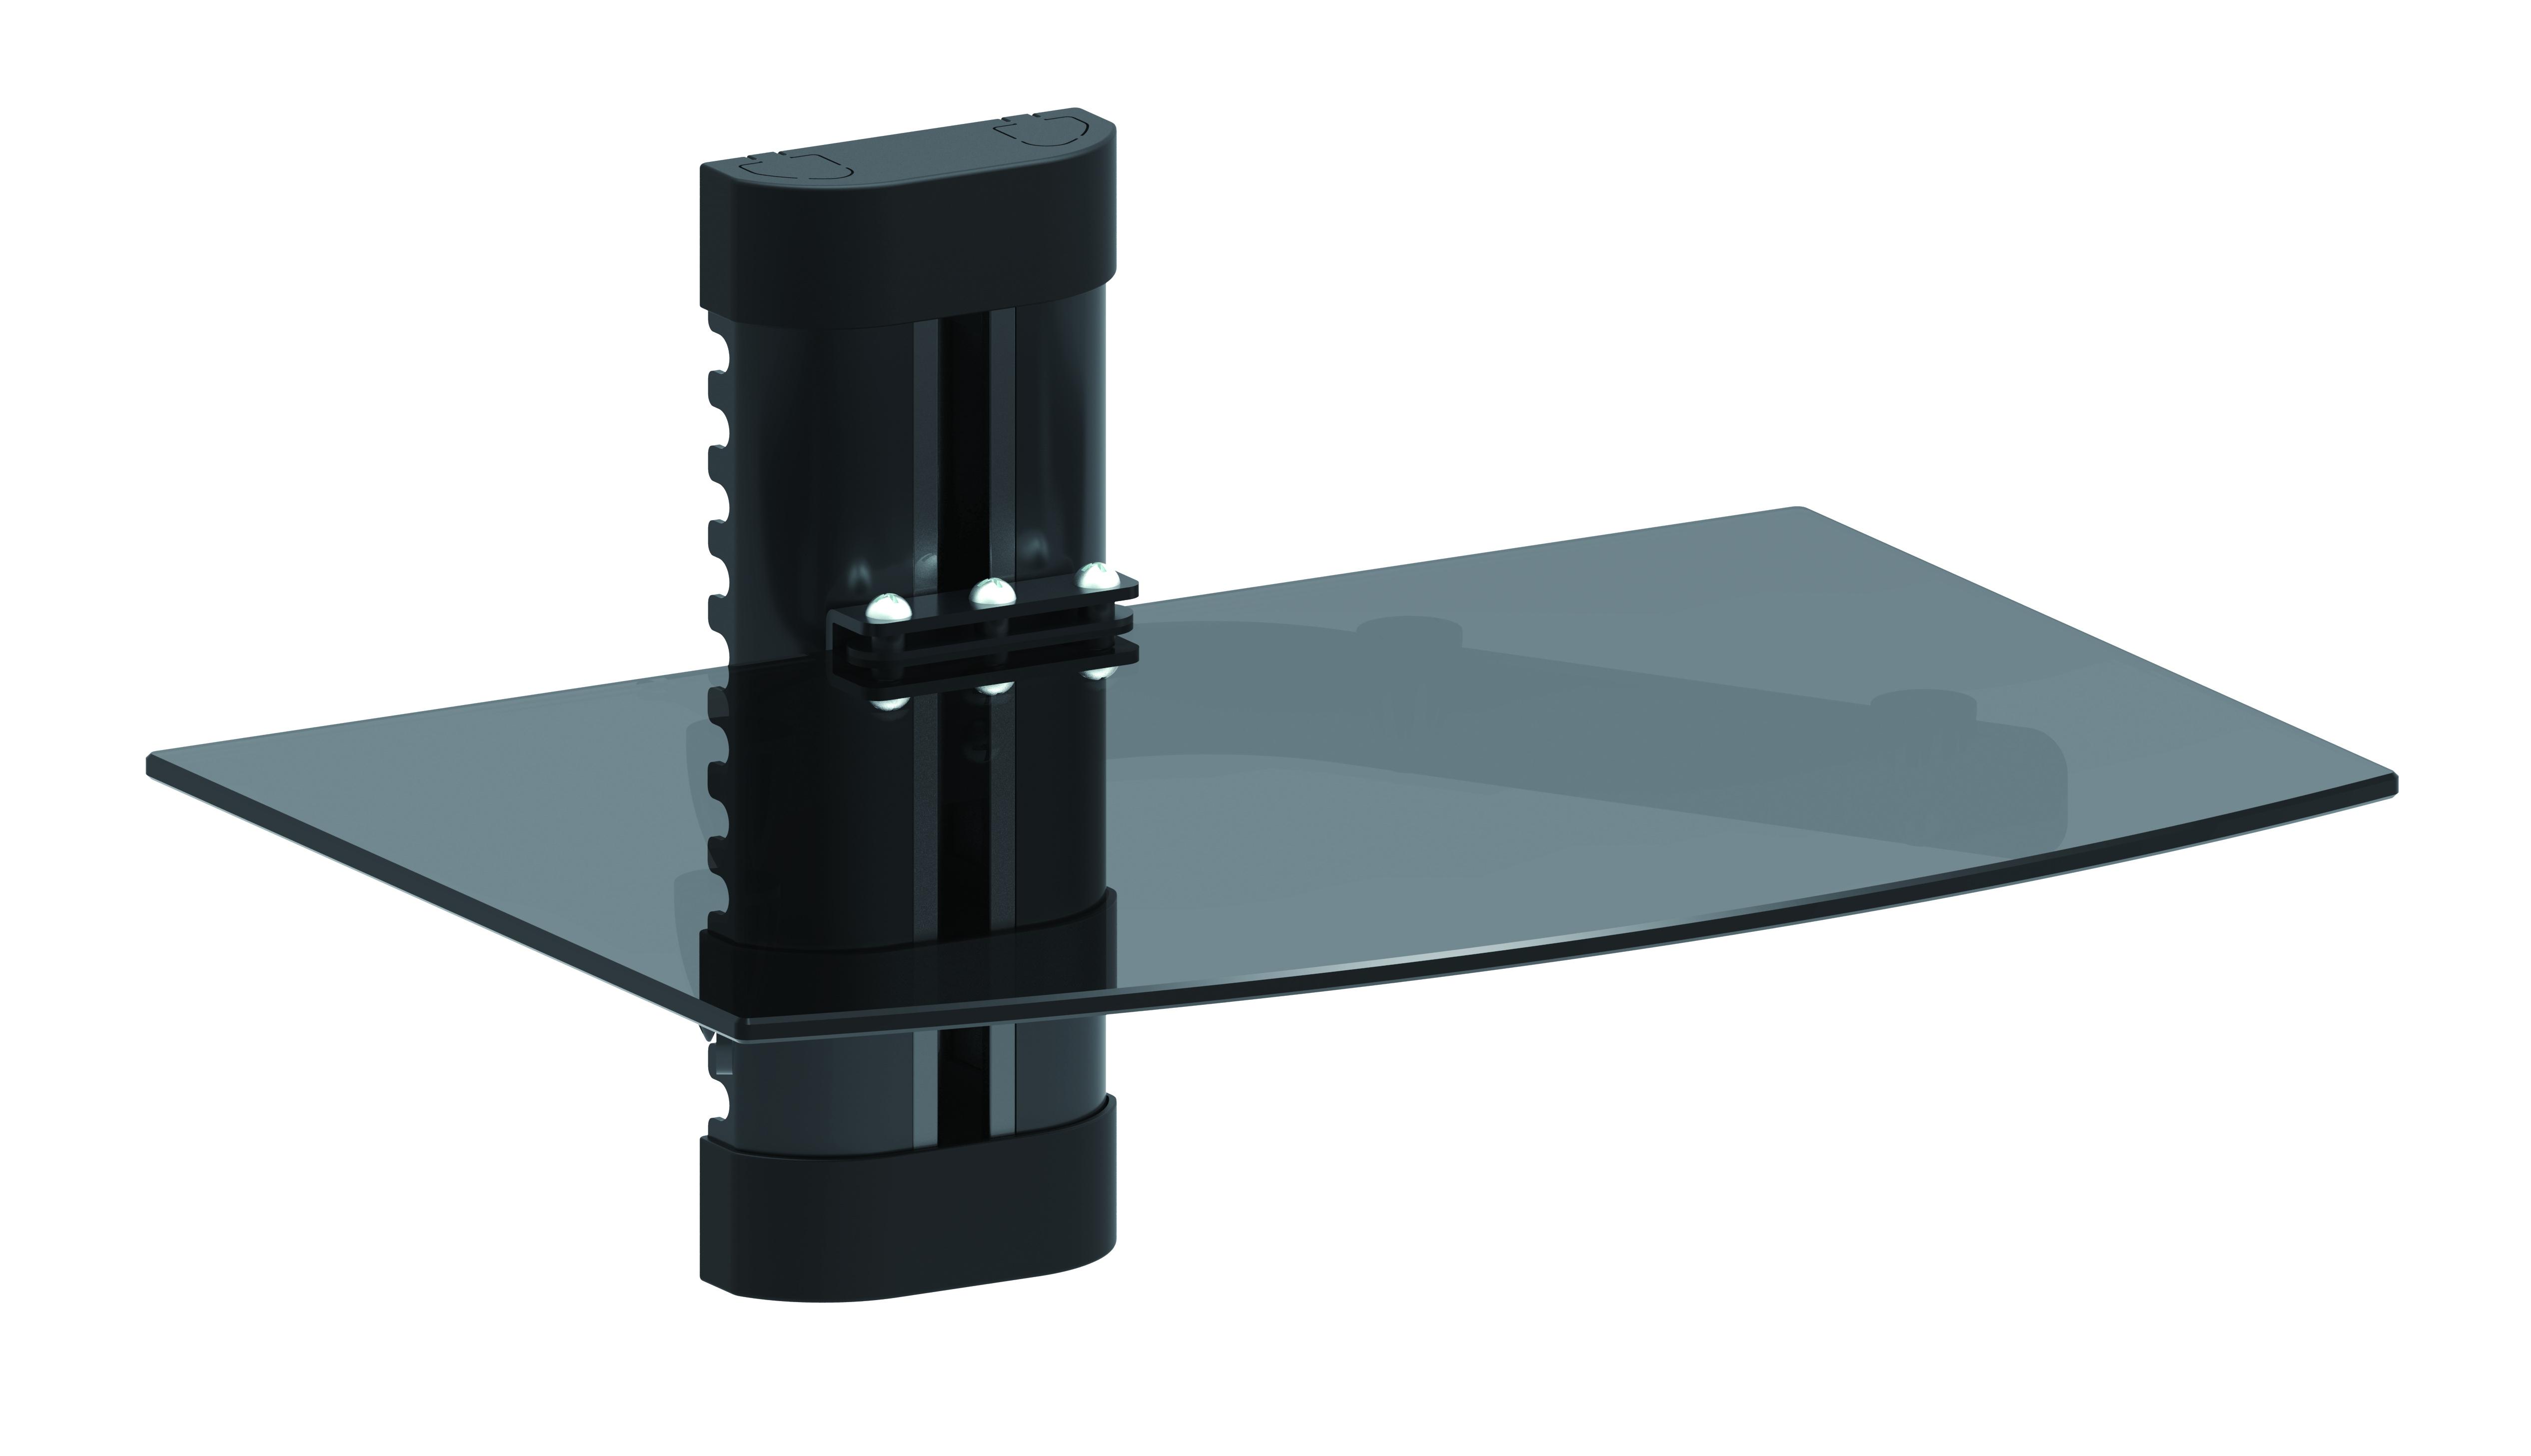 Revez Stb Dvd Receiver Wall Mounted Glass Shelf